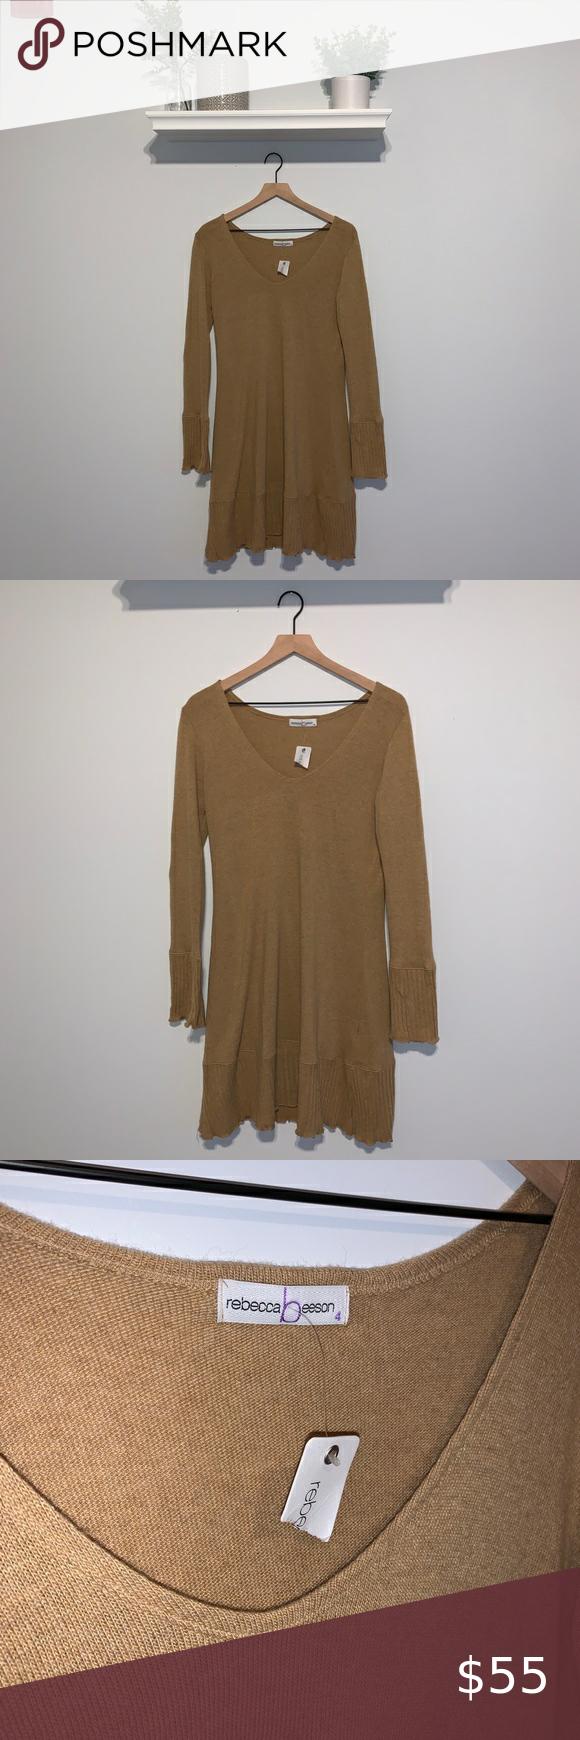 Rebecca Beeson Tan Long Sleeve Dress Long Sleeve Dress Clothes Design Ruffle Bell Sleeve [ 1740 x 580 Pixel ]